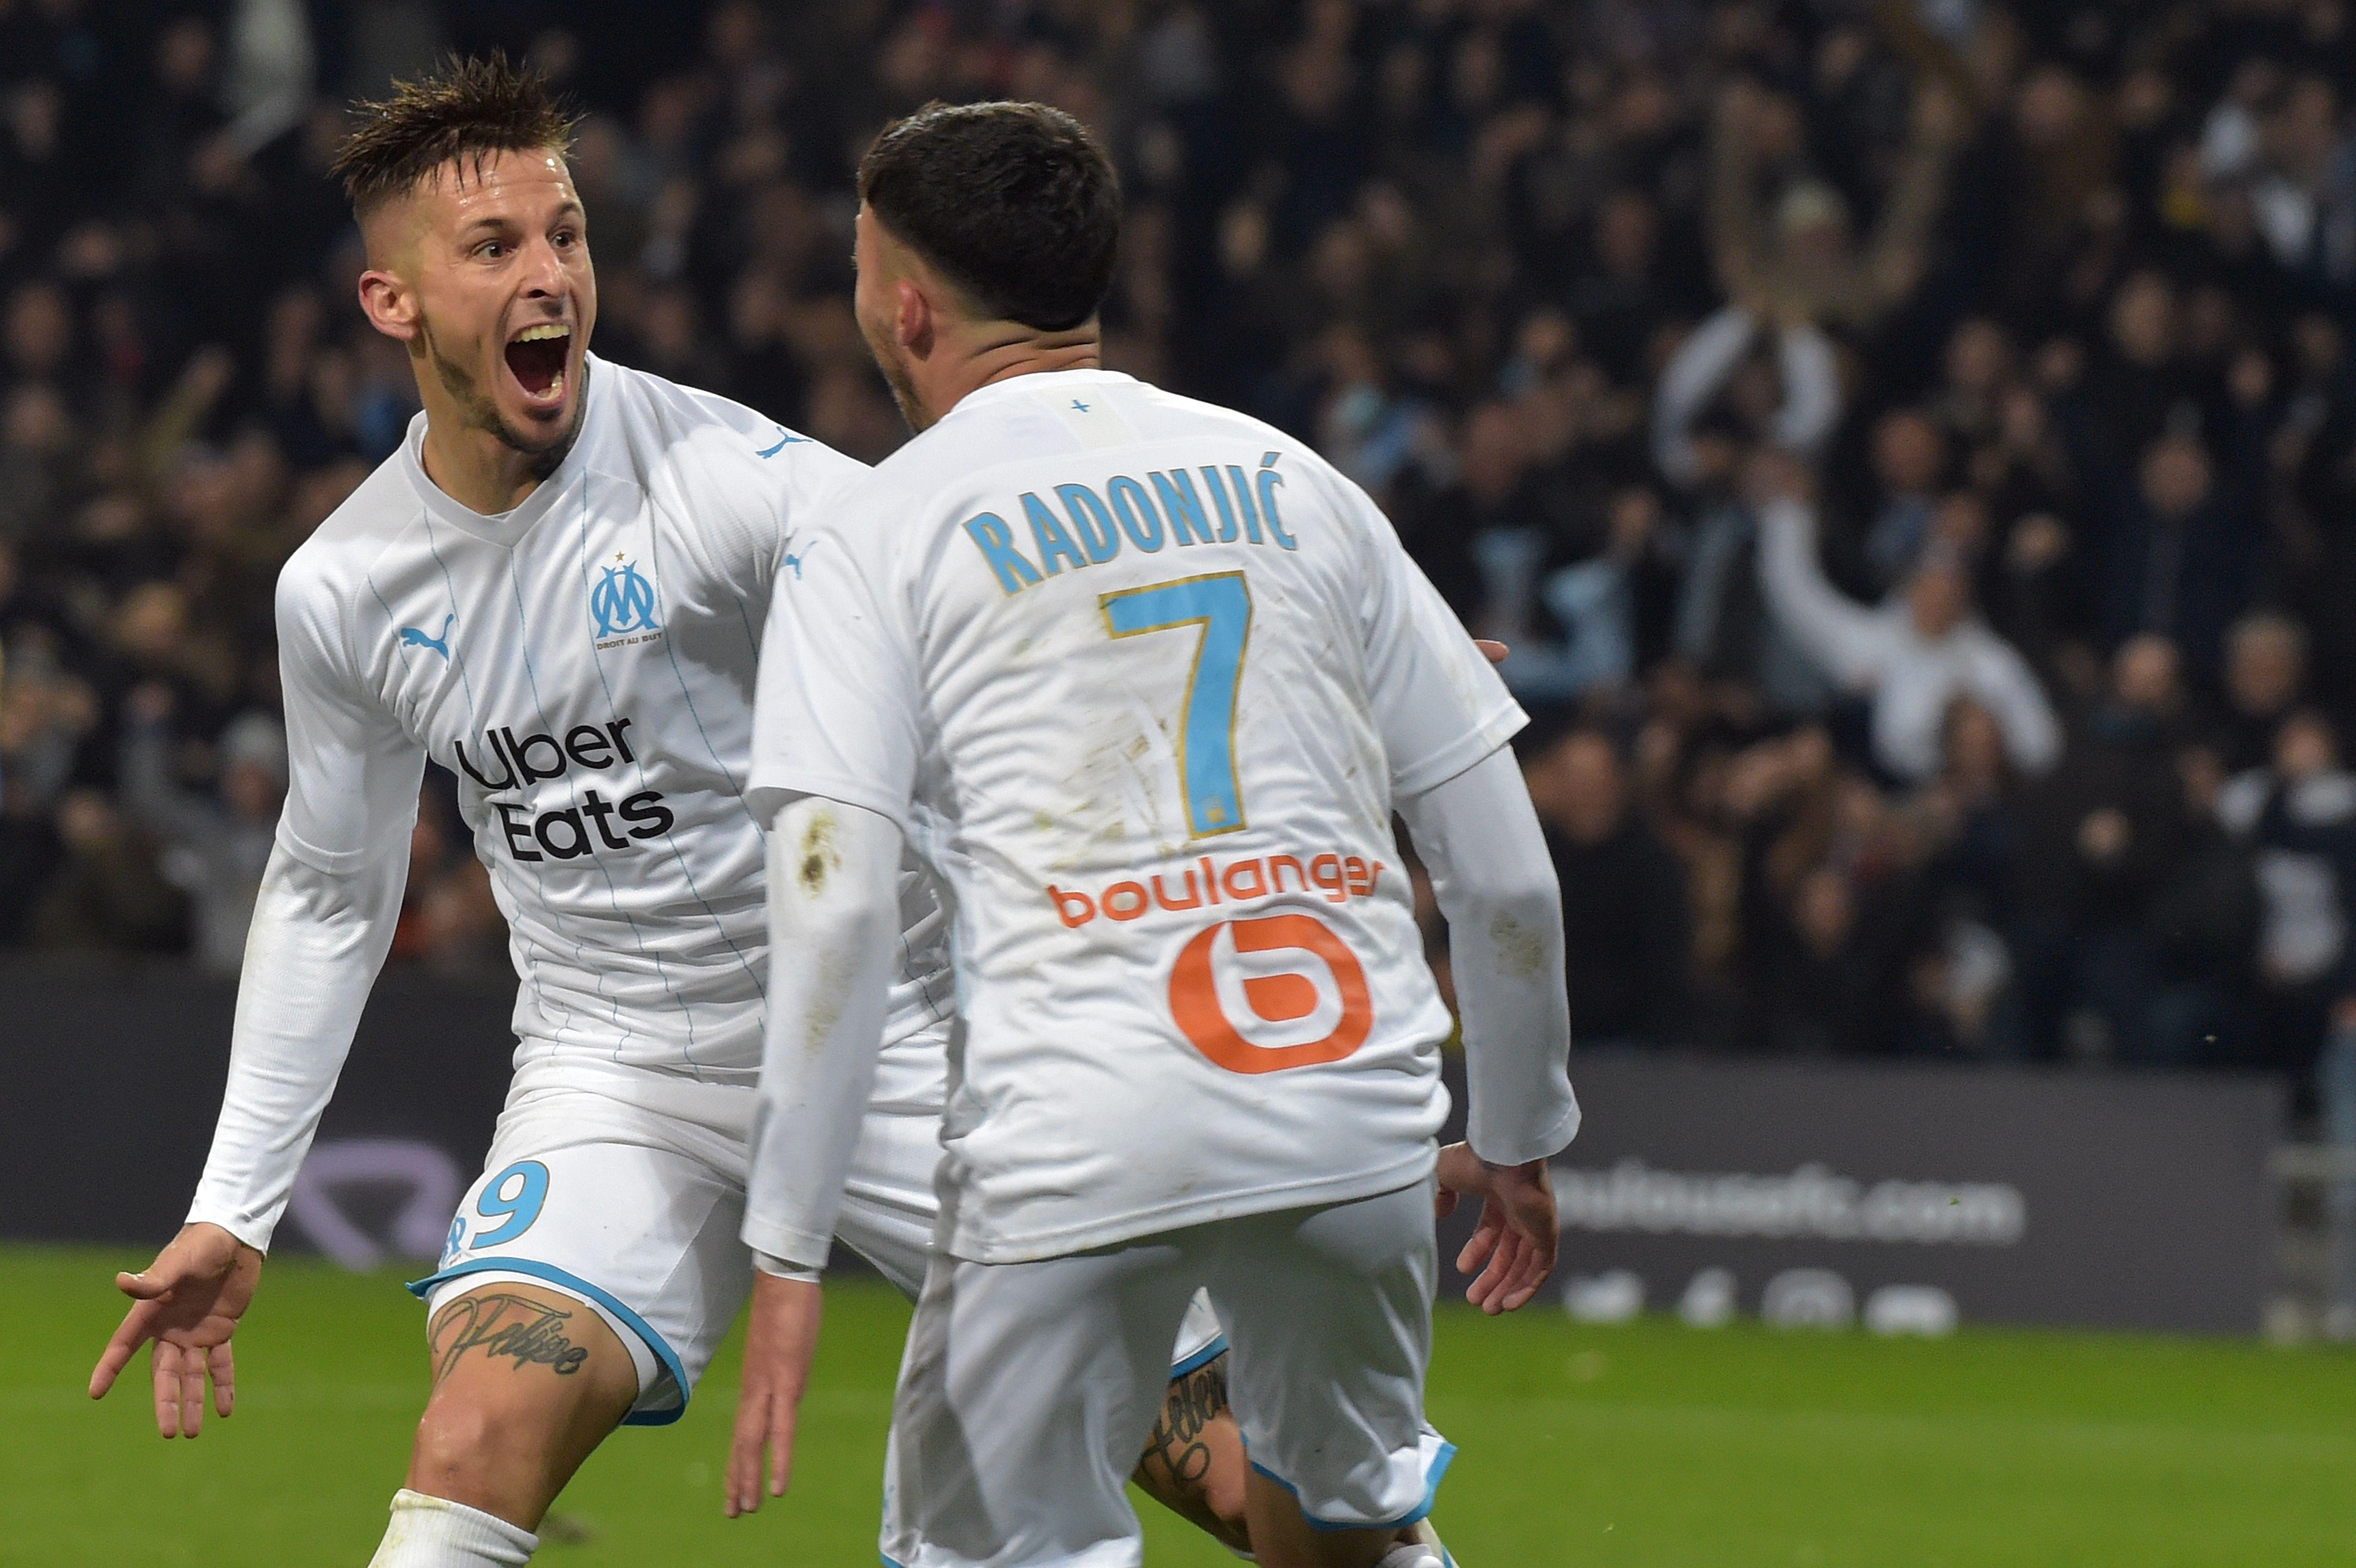 Ligue 1 - Rennes-Marseille : les compositions avec Camavinga, Radonjic et Kamara au milieu